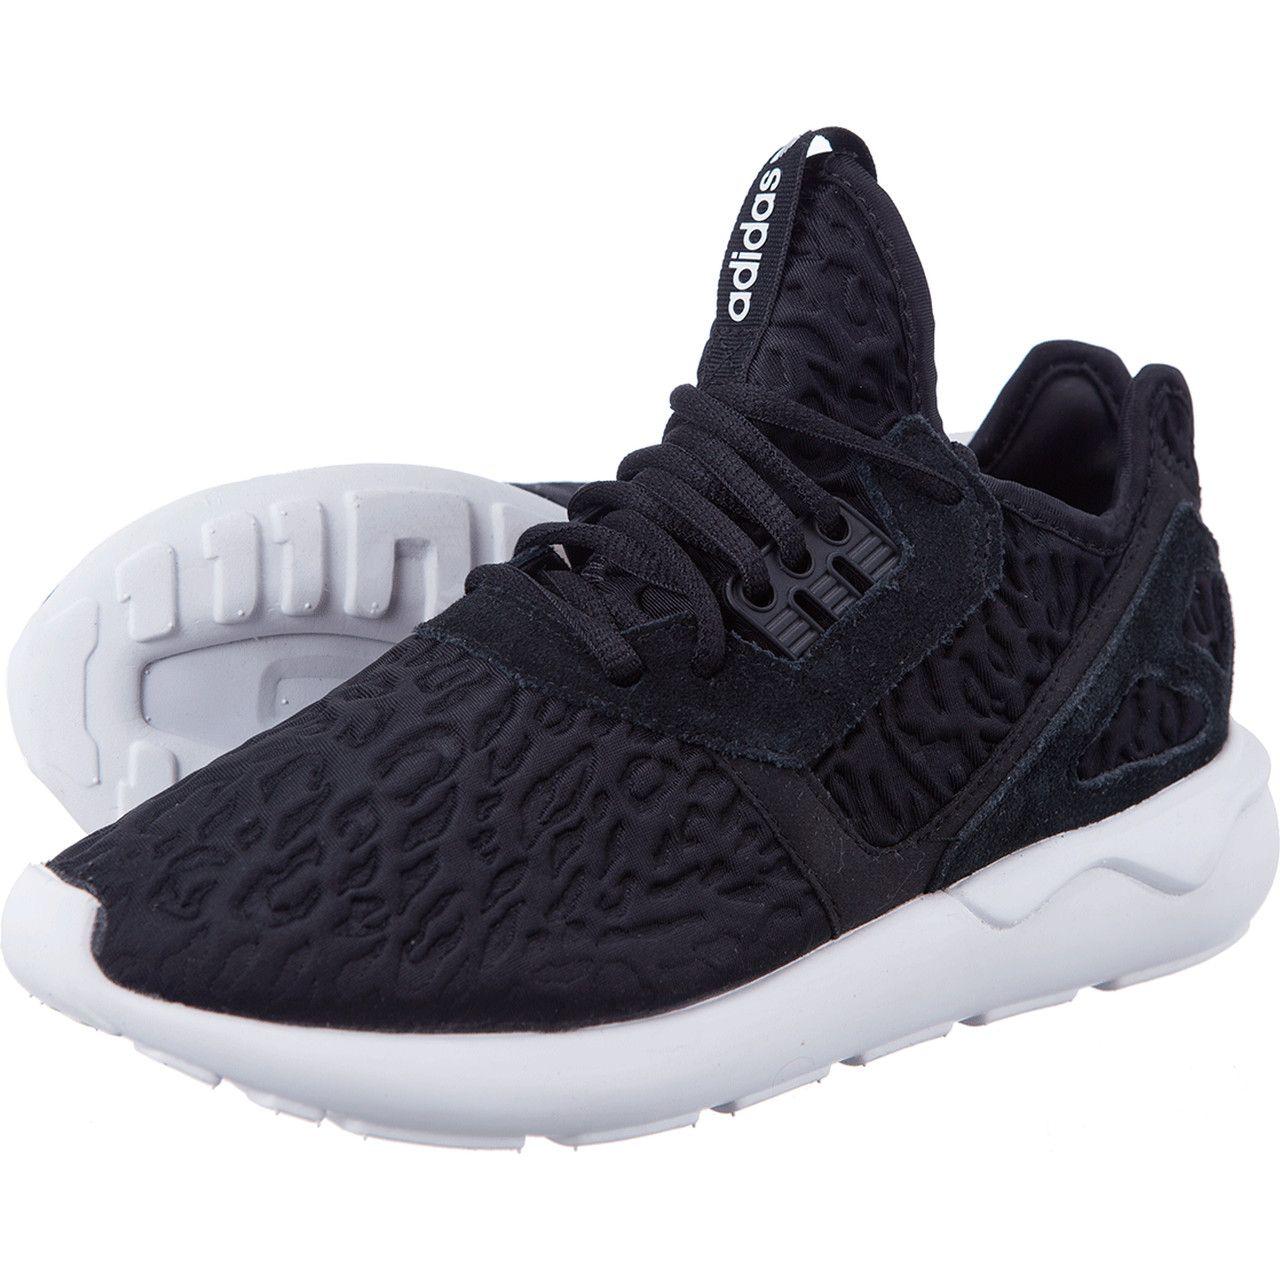 wholesale dealer 885d2 ecff1 Buty adidas Tubular Runner W 928 | Adidas | Adidas tubular ...